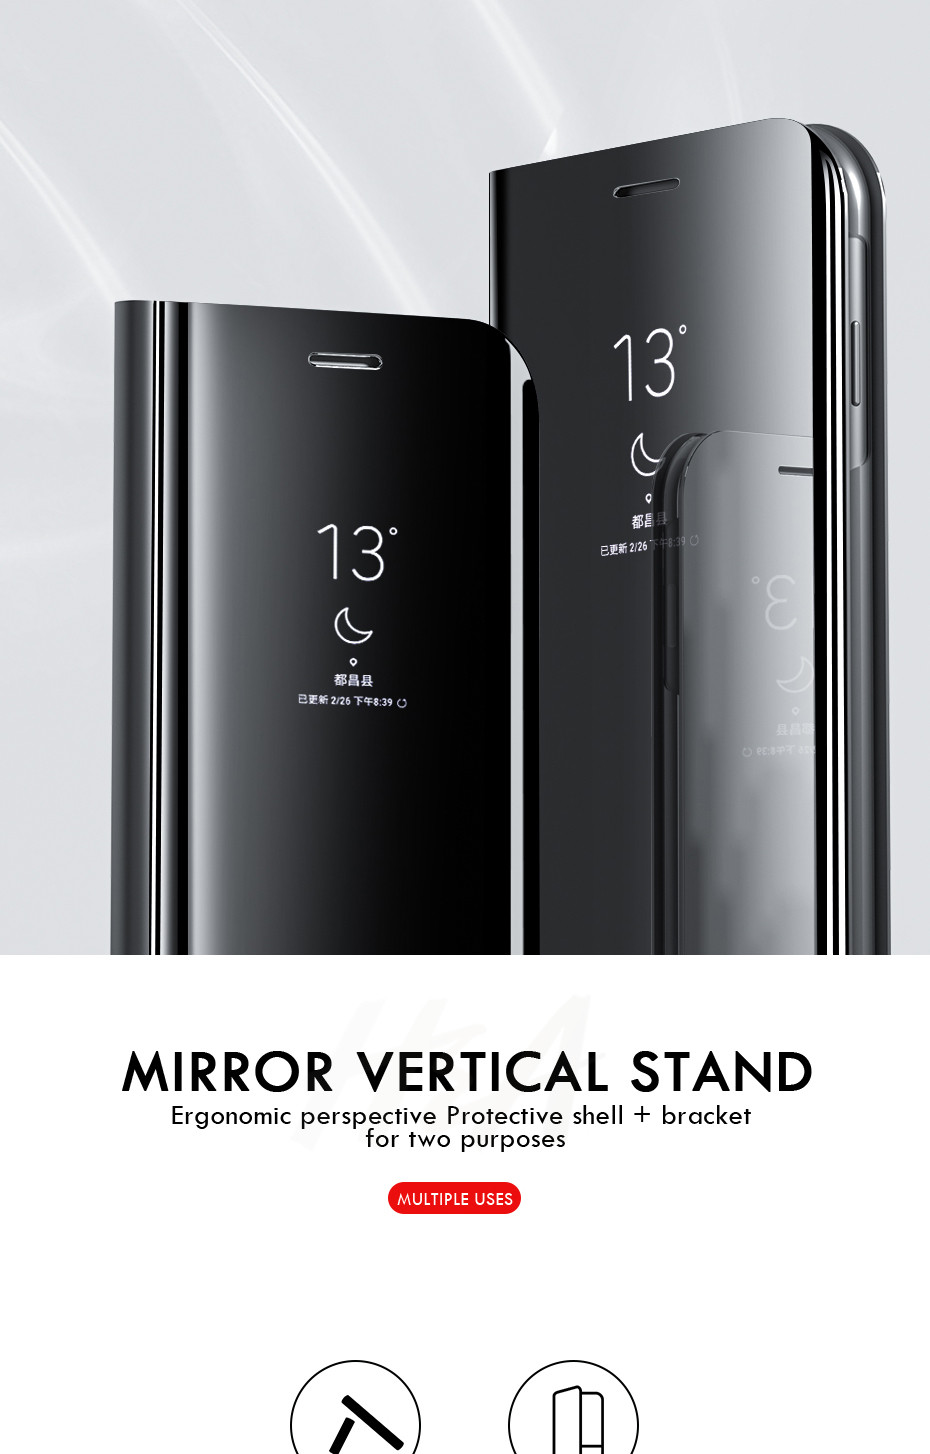 HTB1E7ydadfvK1RjSspoq6zfNpXaW H & A Clear View Smart Spiegel Telefon Fall Für Samsung Galaxy S9 S8 S7 S6 Rand Plus Hinweis 8 9 für A3 A5 A7 A8 2017 J3 J7 2018 Fall